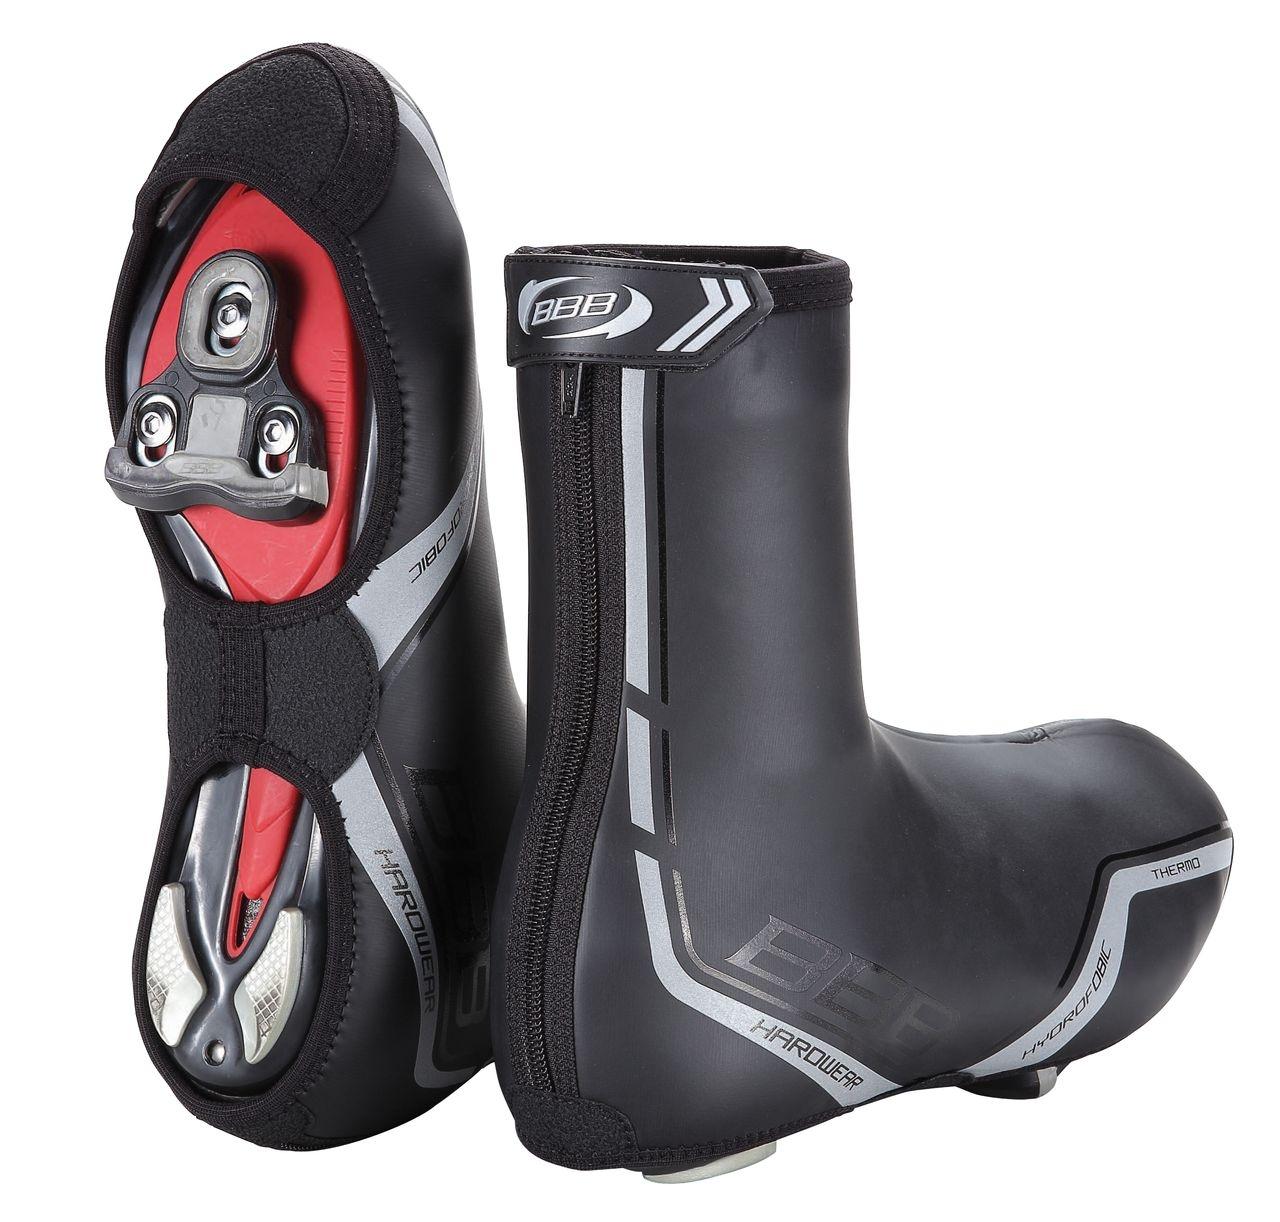 Couvre-chaussures BBB HardWear Noir - BWS-04 - 47/48